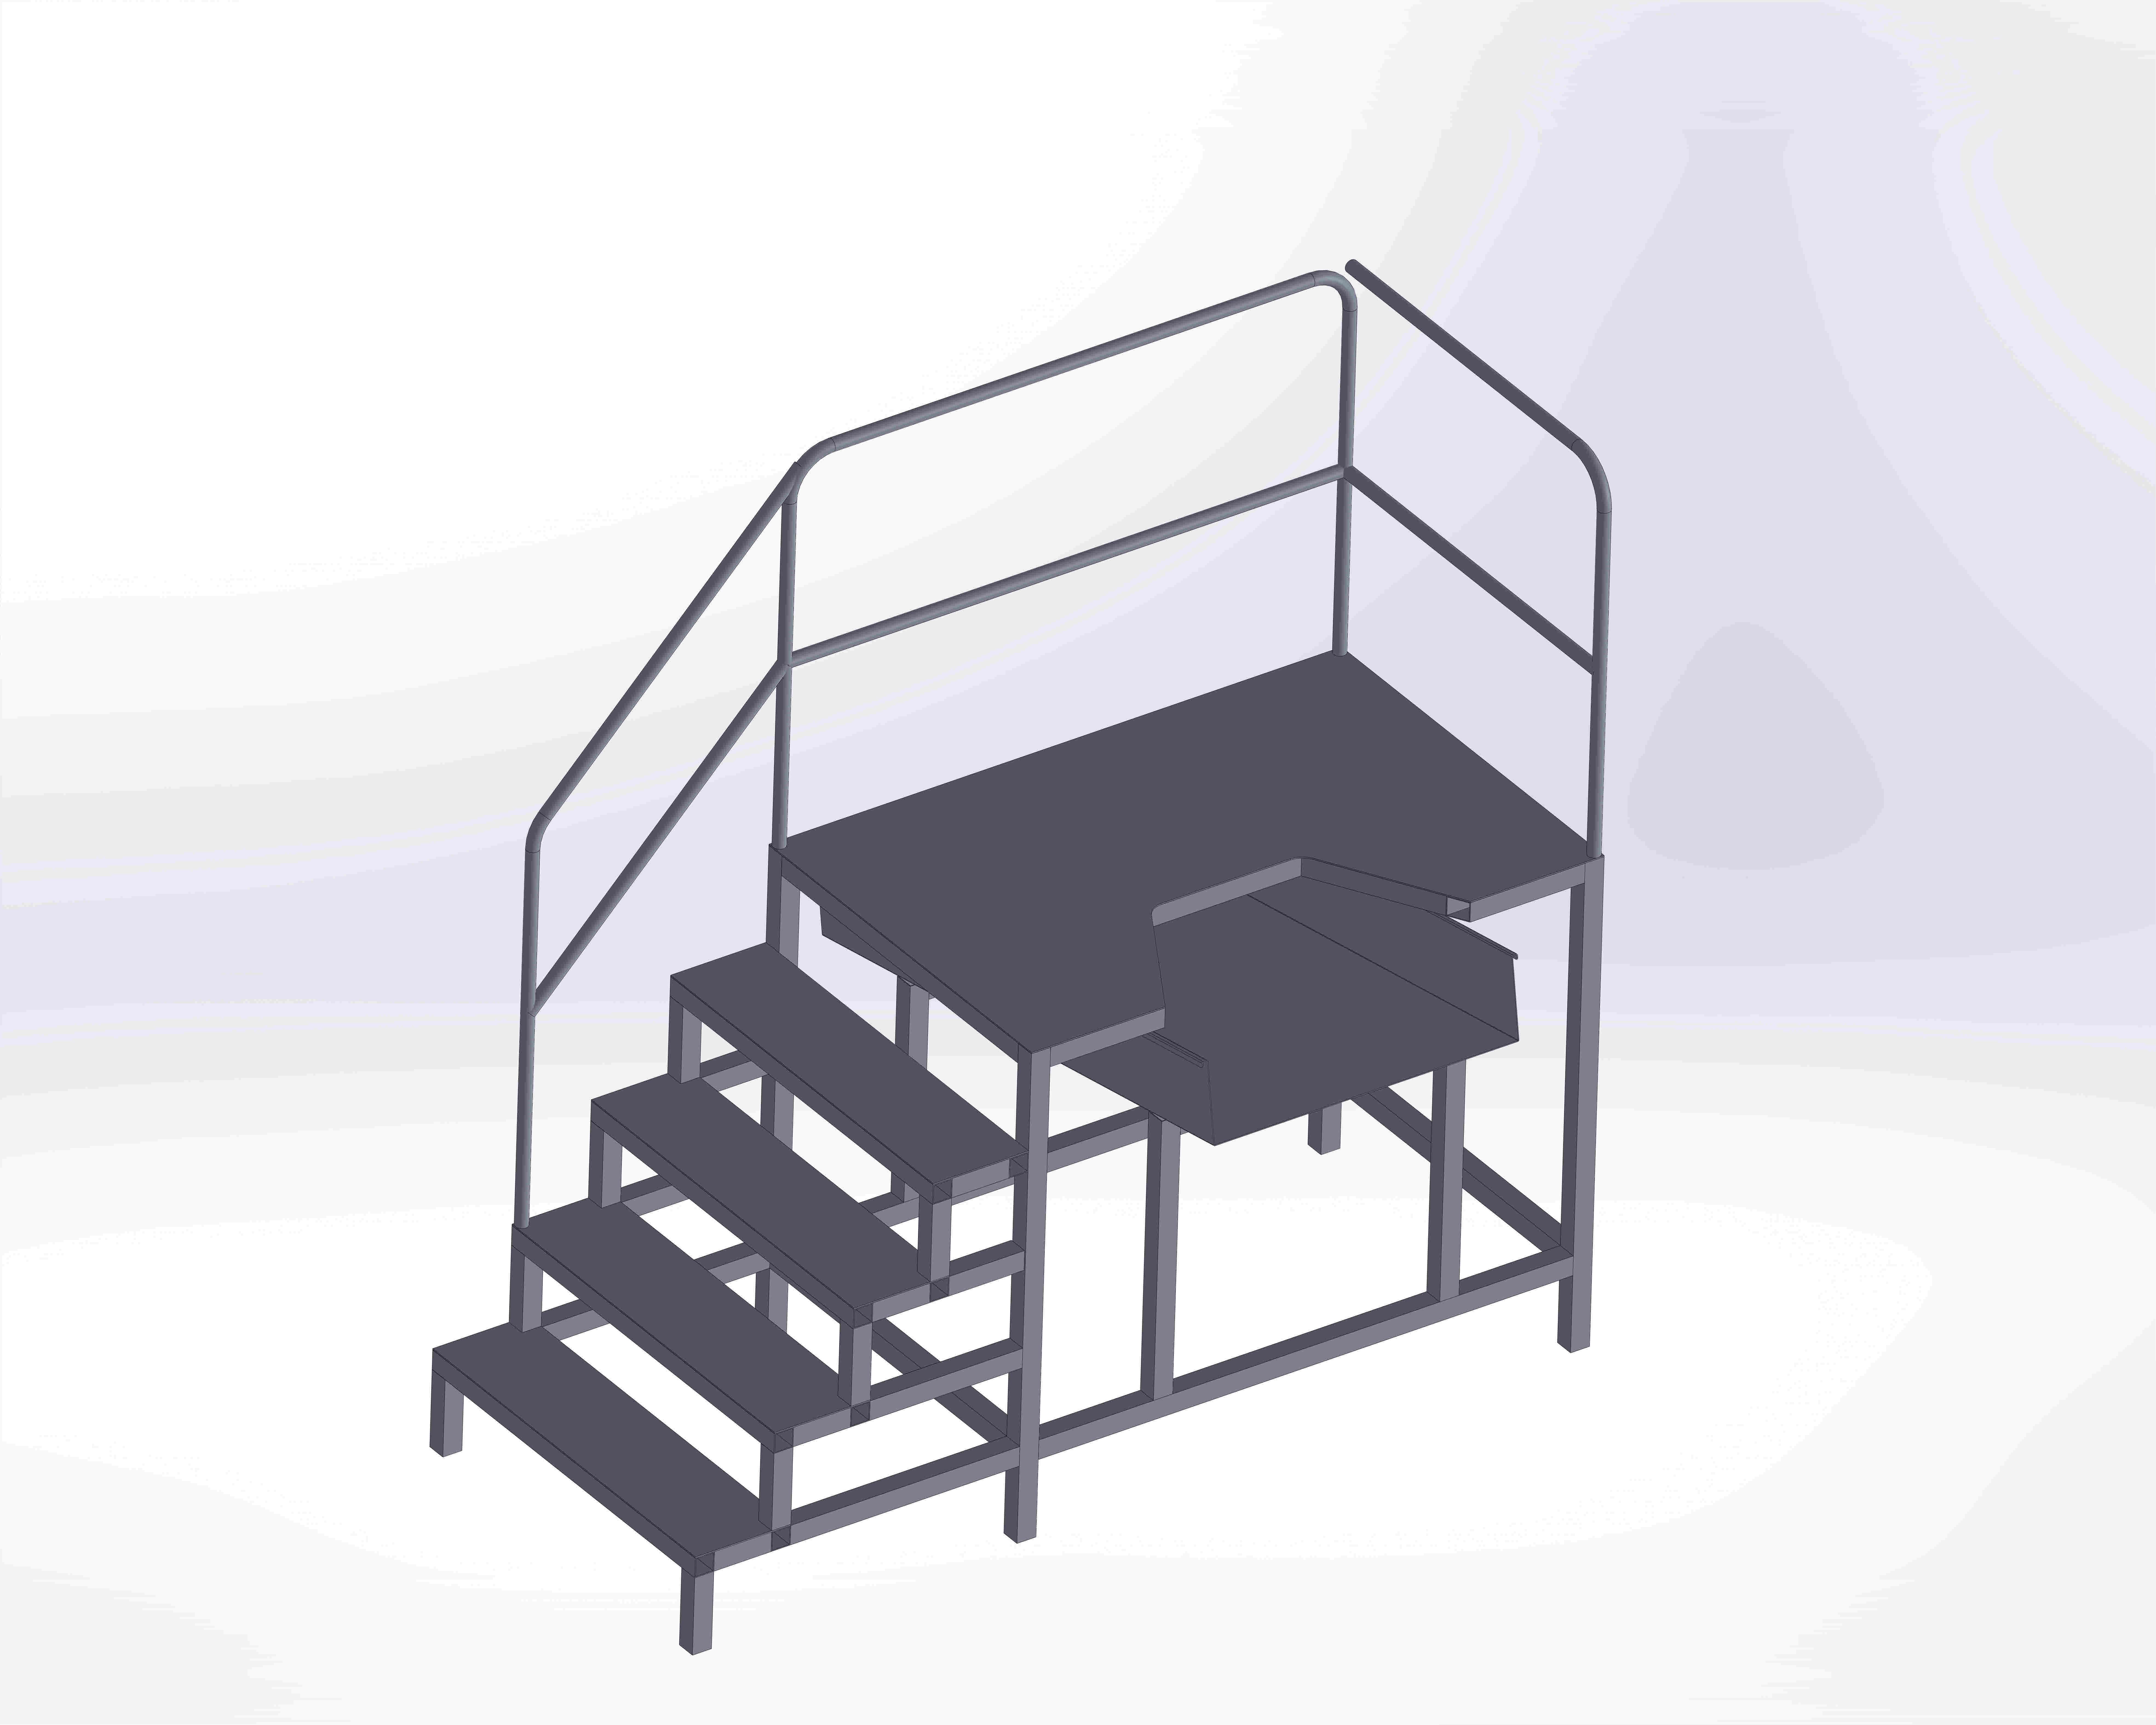 Viscera Removing Platform - Stationary